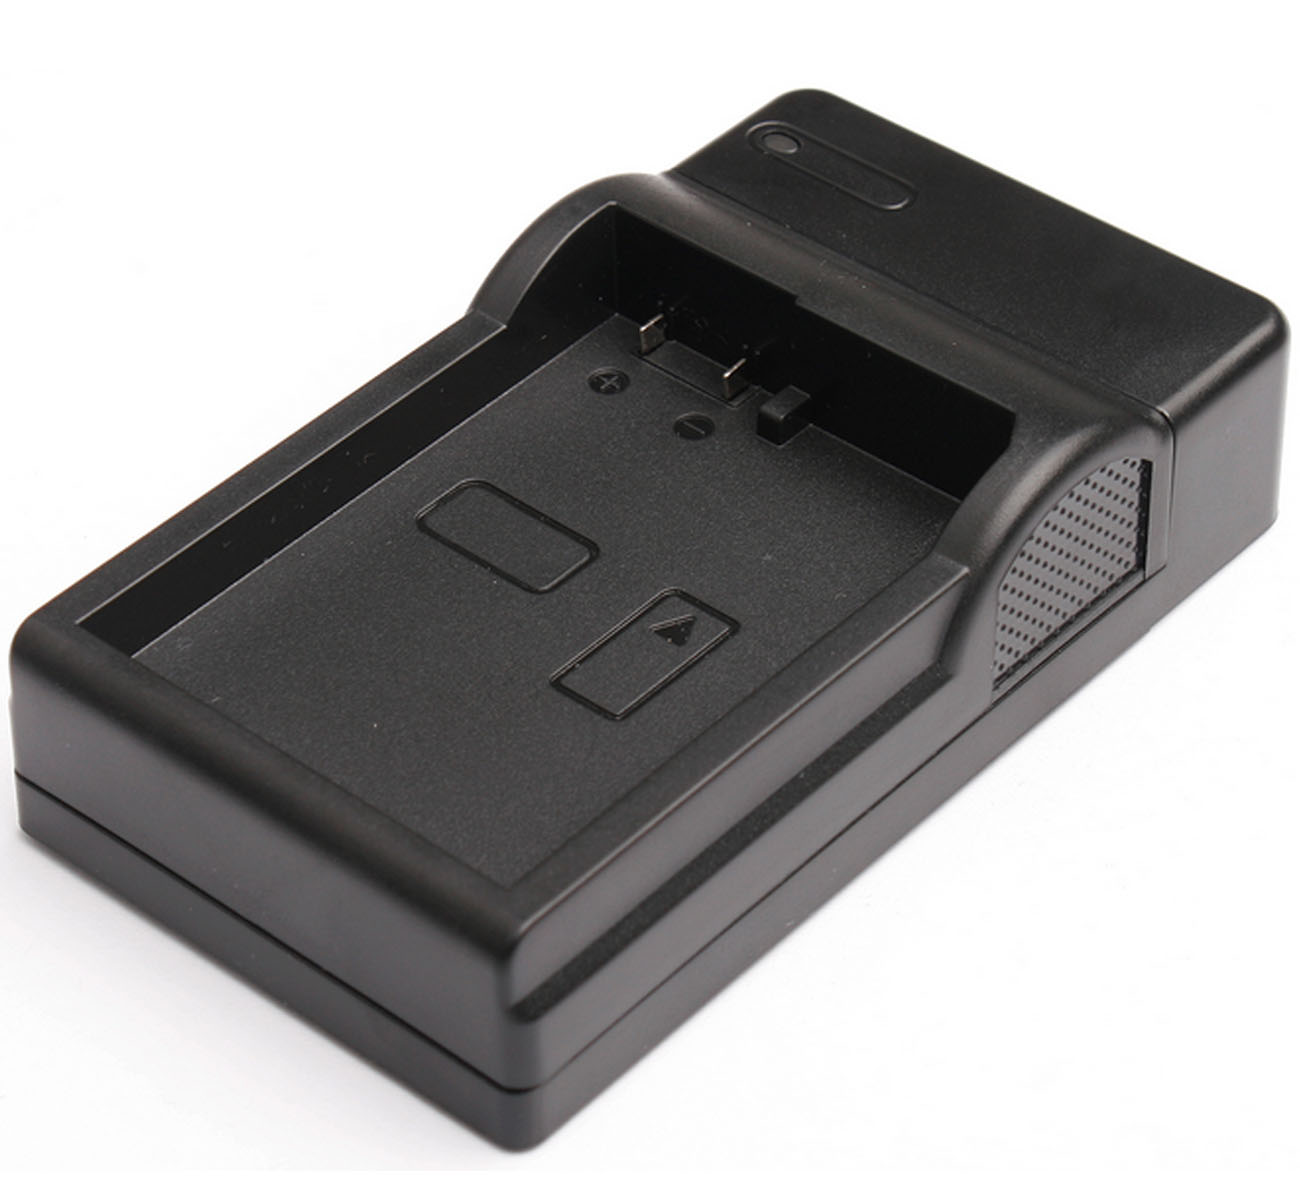 VPC-PD2 VPC-PD1 VPC-PD2BK Camcorder Battery Pack for Sanyo Xacti VPC-CS1